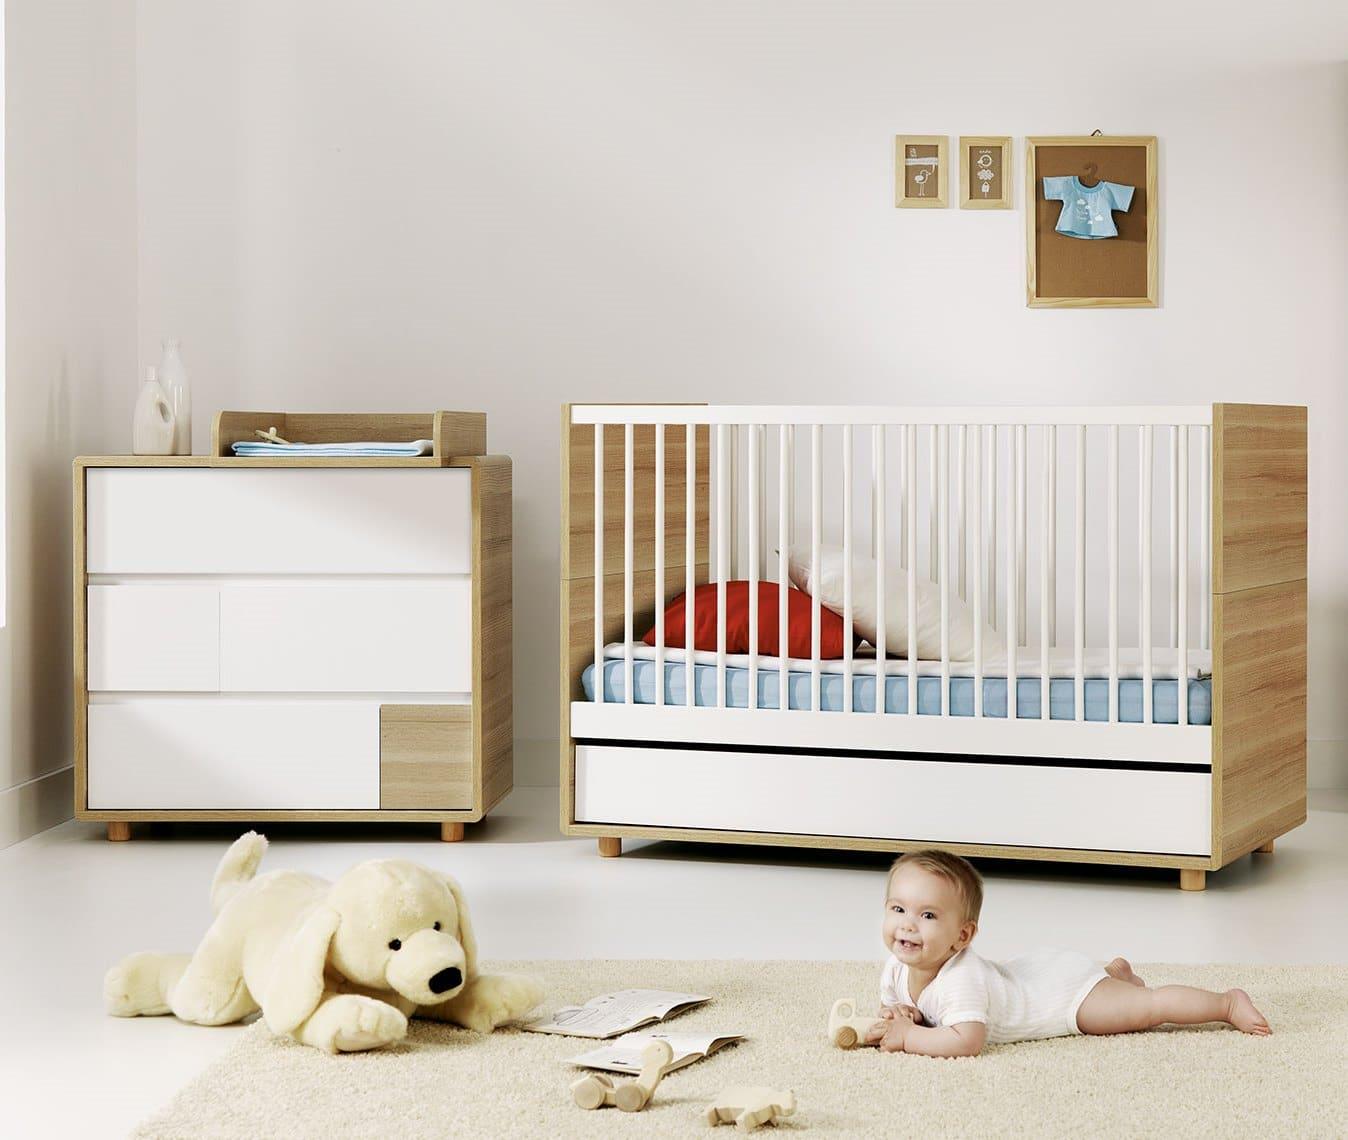 baby vox evolve 2 meubles lit 140x70 avec tiroir. Black Bedroom Furniture Sets. Home Design Ideas